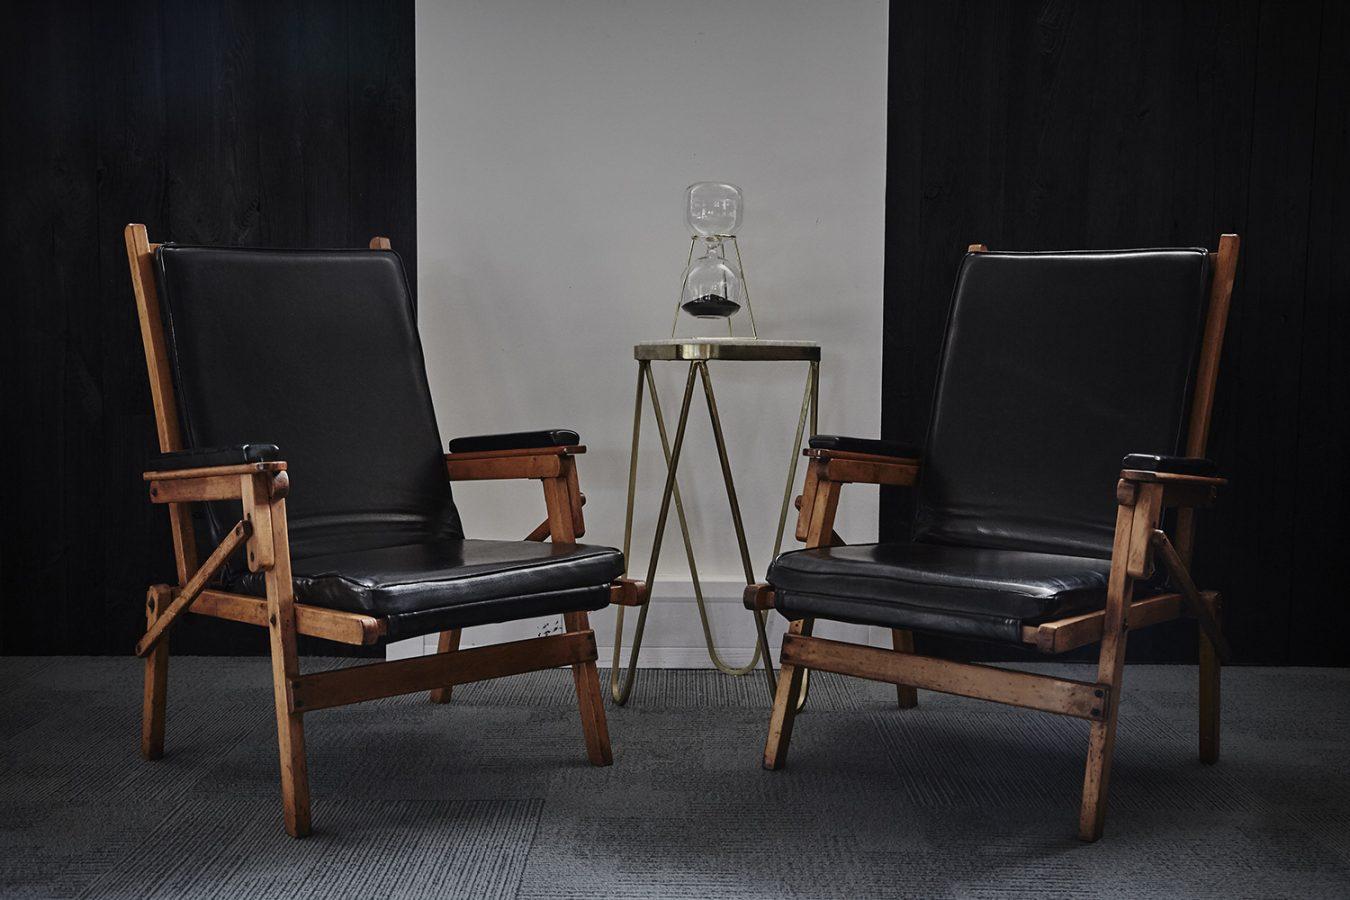 Good_Stuff_717_cool_workspace_office_design_interiors_graphic_london_furniture